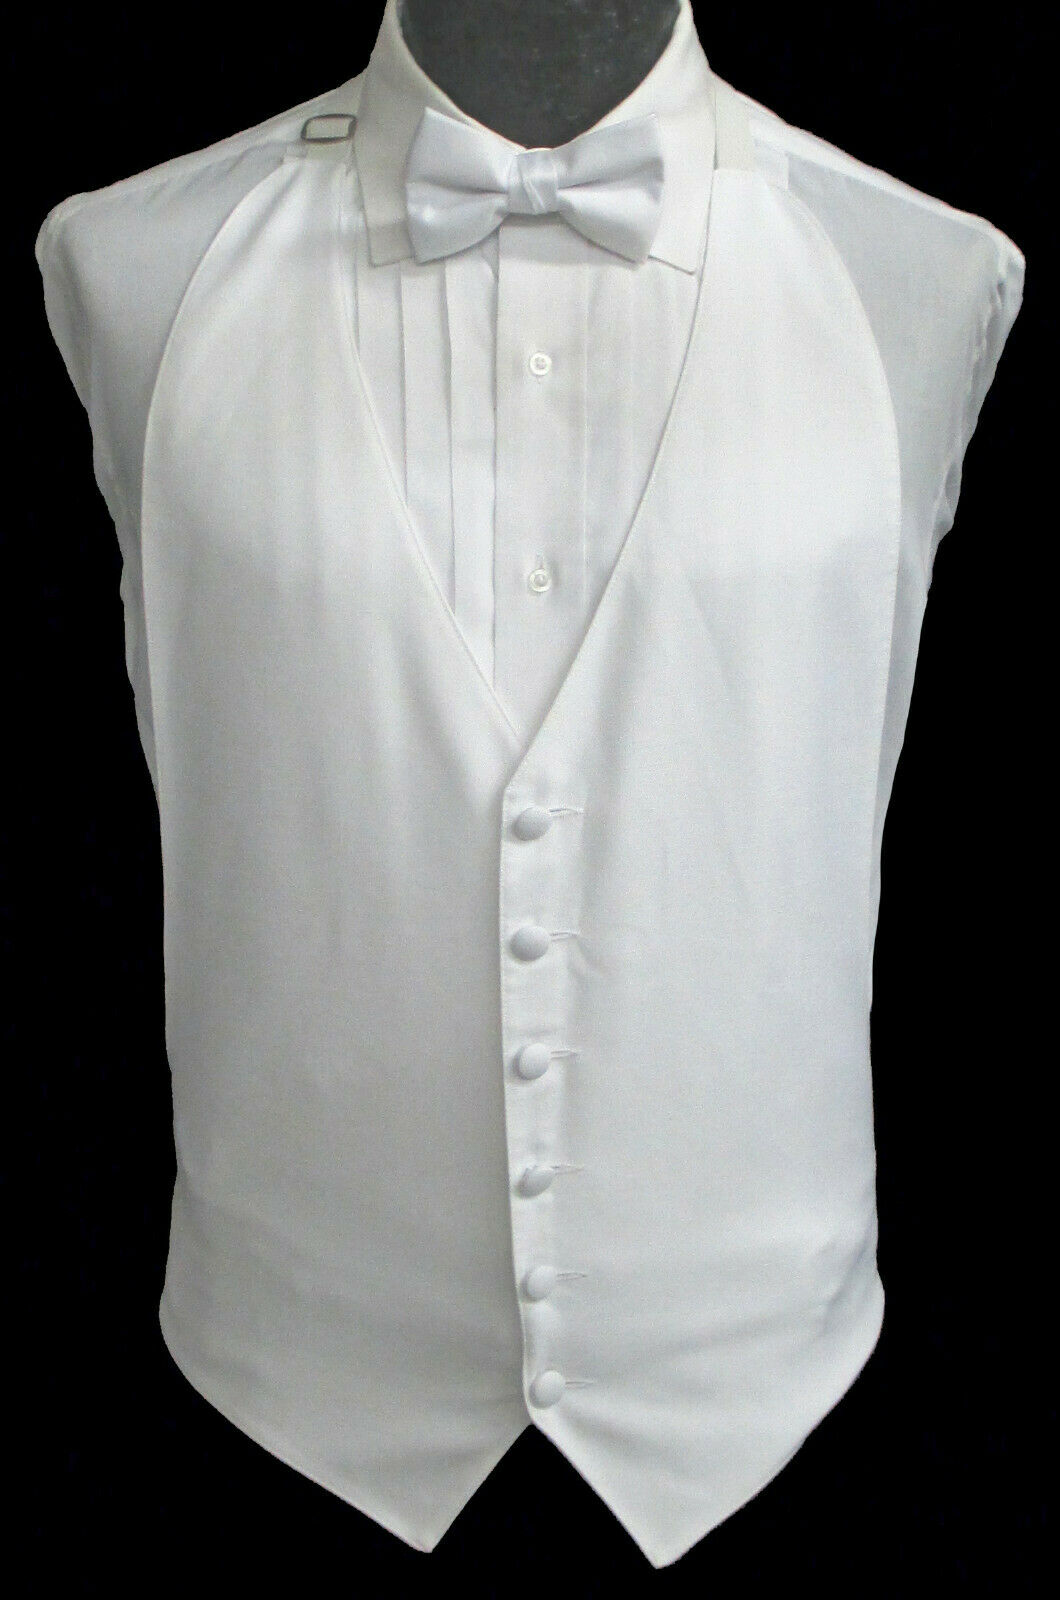 Men's White Open Back Backless Tuxedo Vest Costume Cosplay Cheap Discount